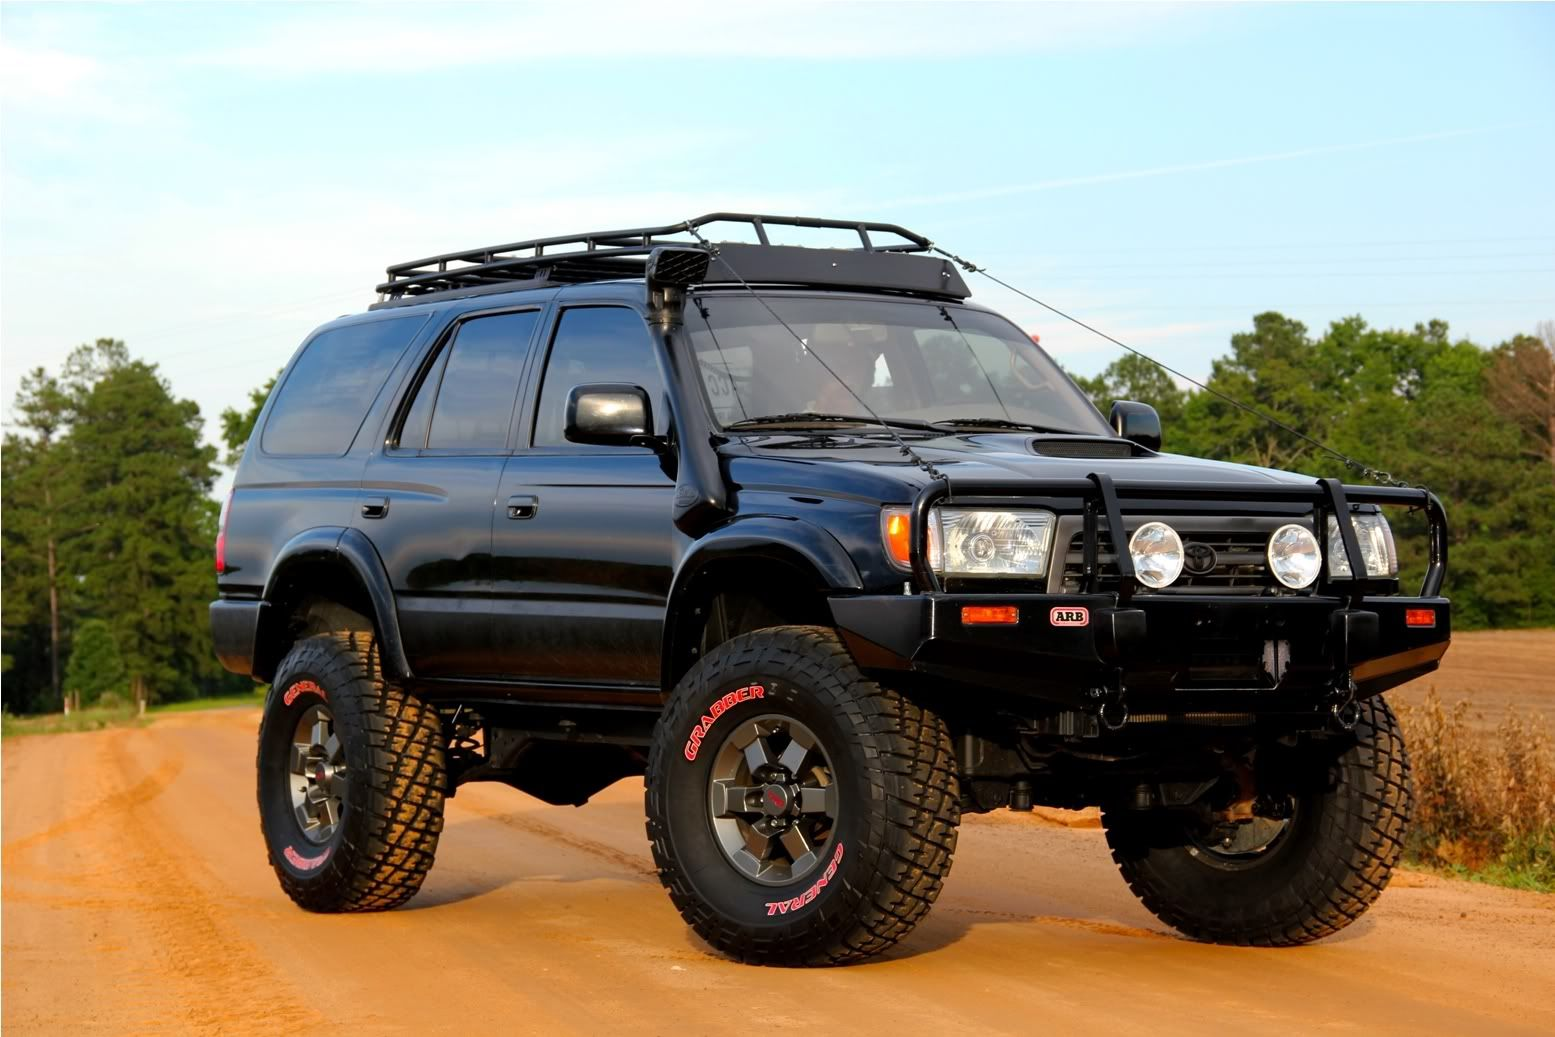 4 The Car I Would Drive Esurancedreamroadtrip 1997 Toyota 4runner Camionetas Toyota Camiones Levantados Camioneta Nissan